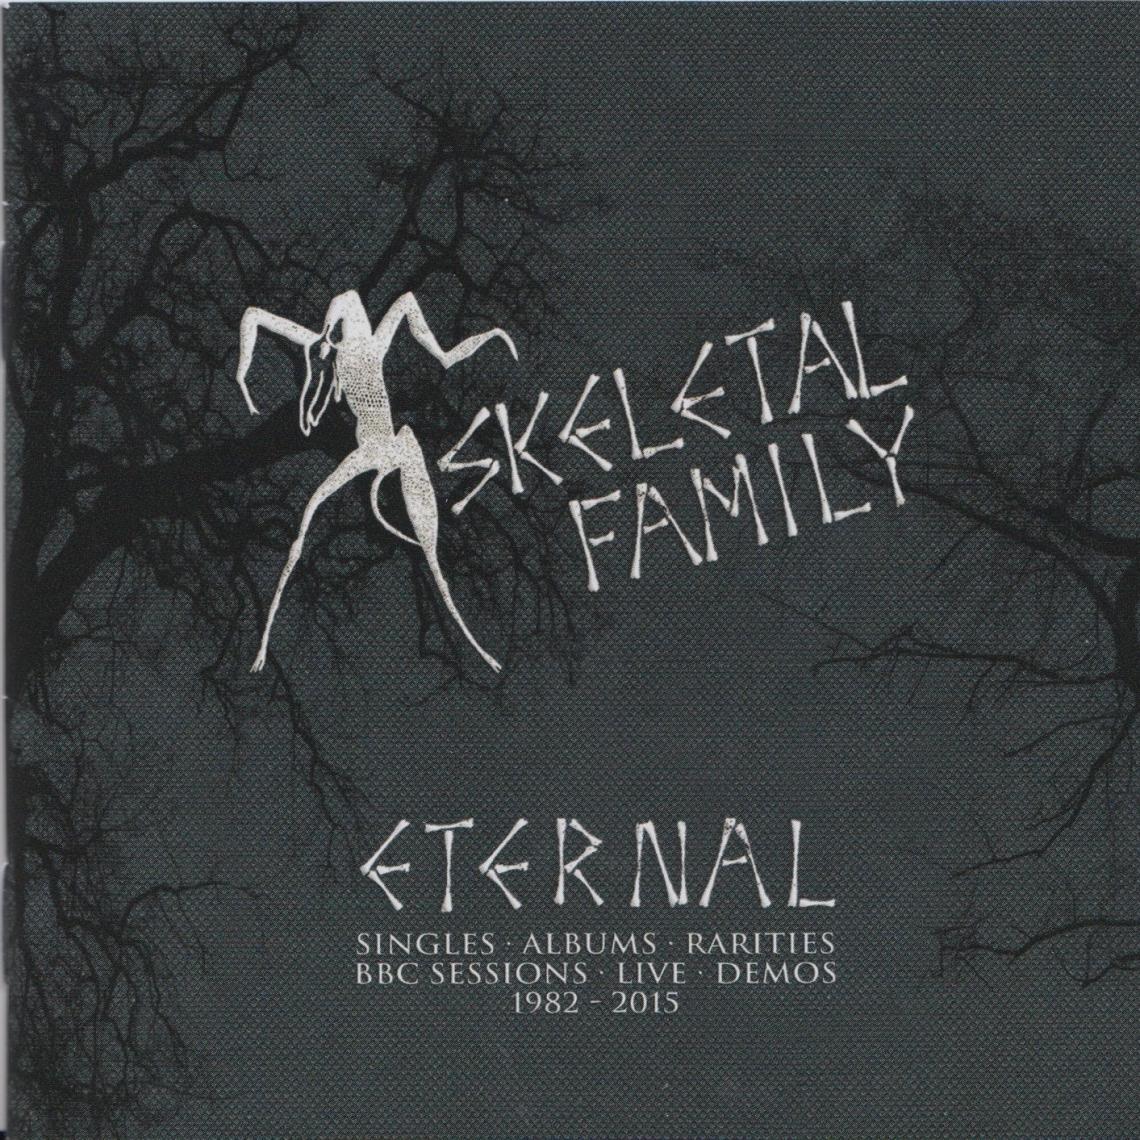 Skeletal Family – Eternal – CD Boxset review